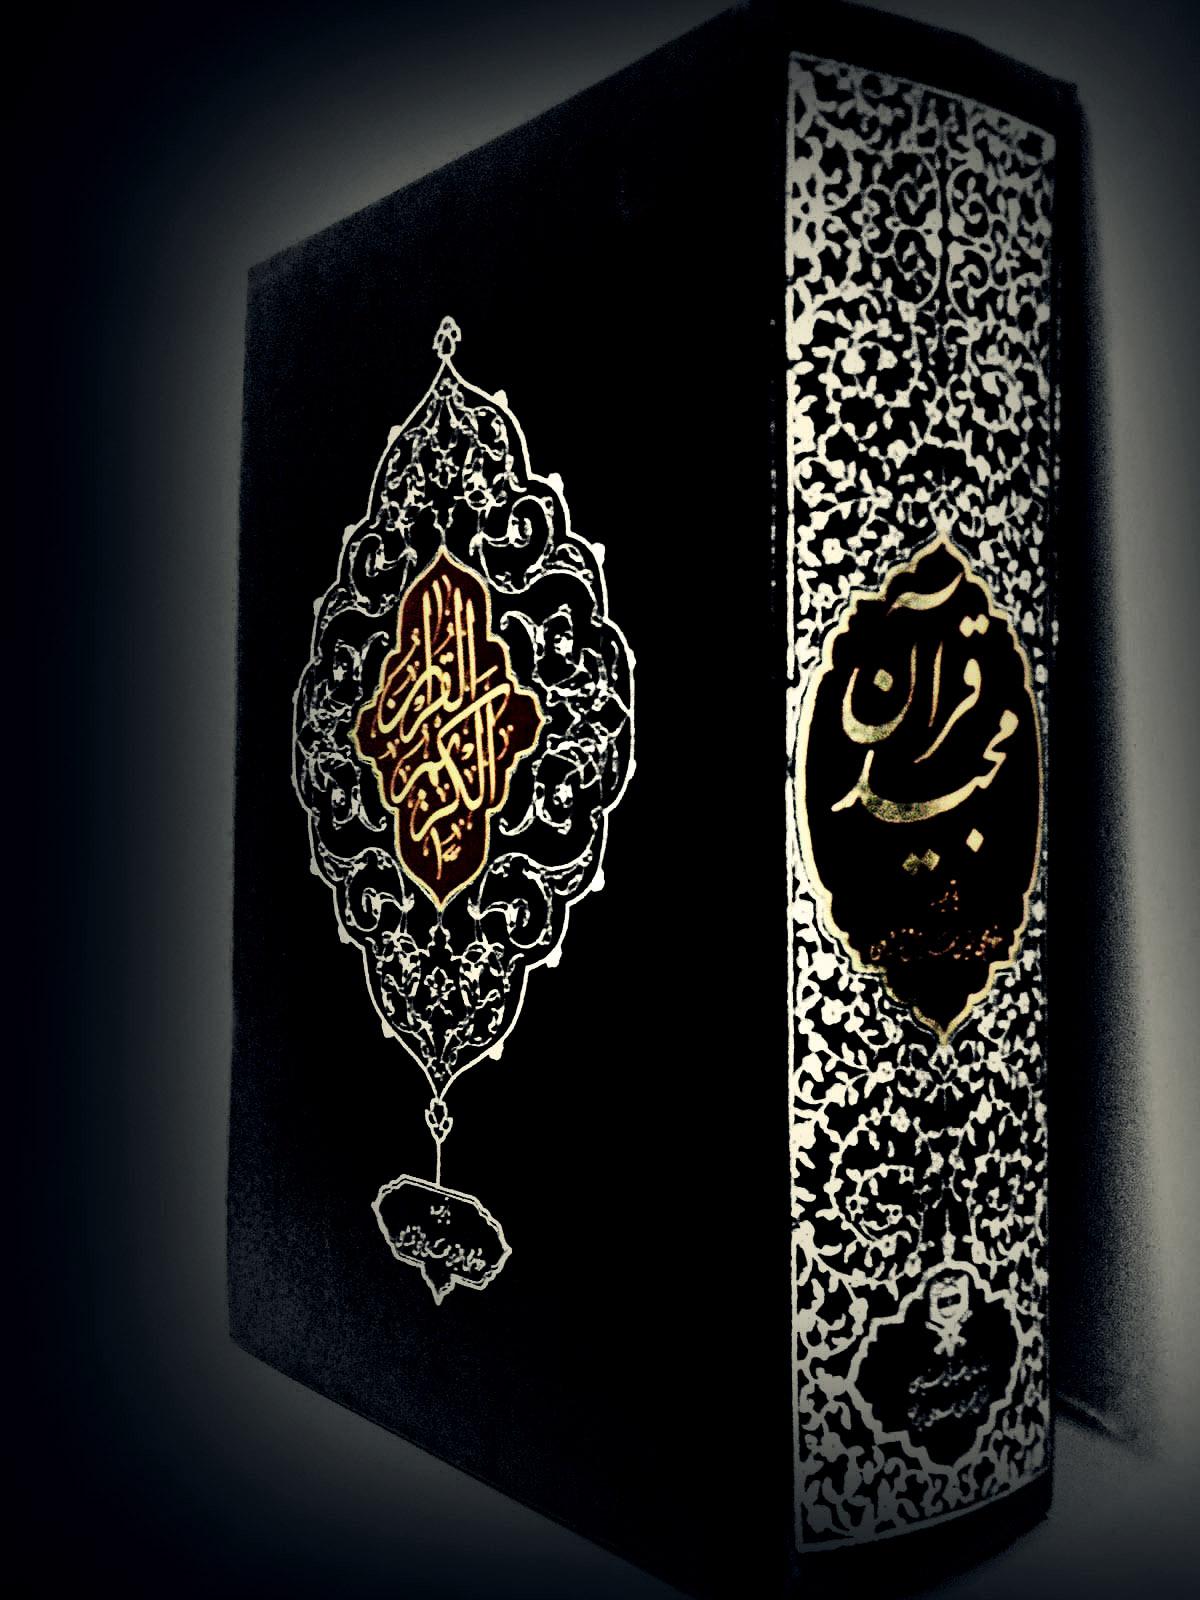 93 939983 islamic image wallpaper hd